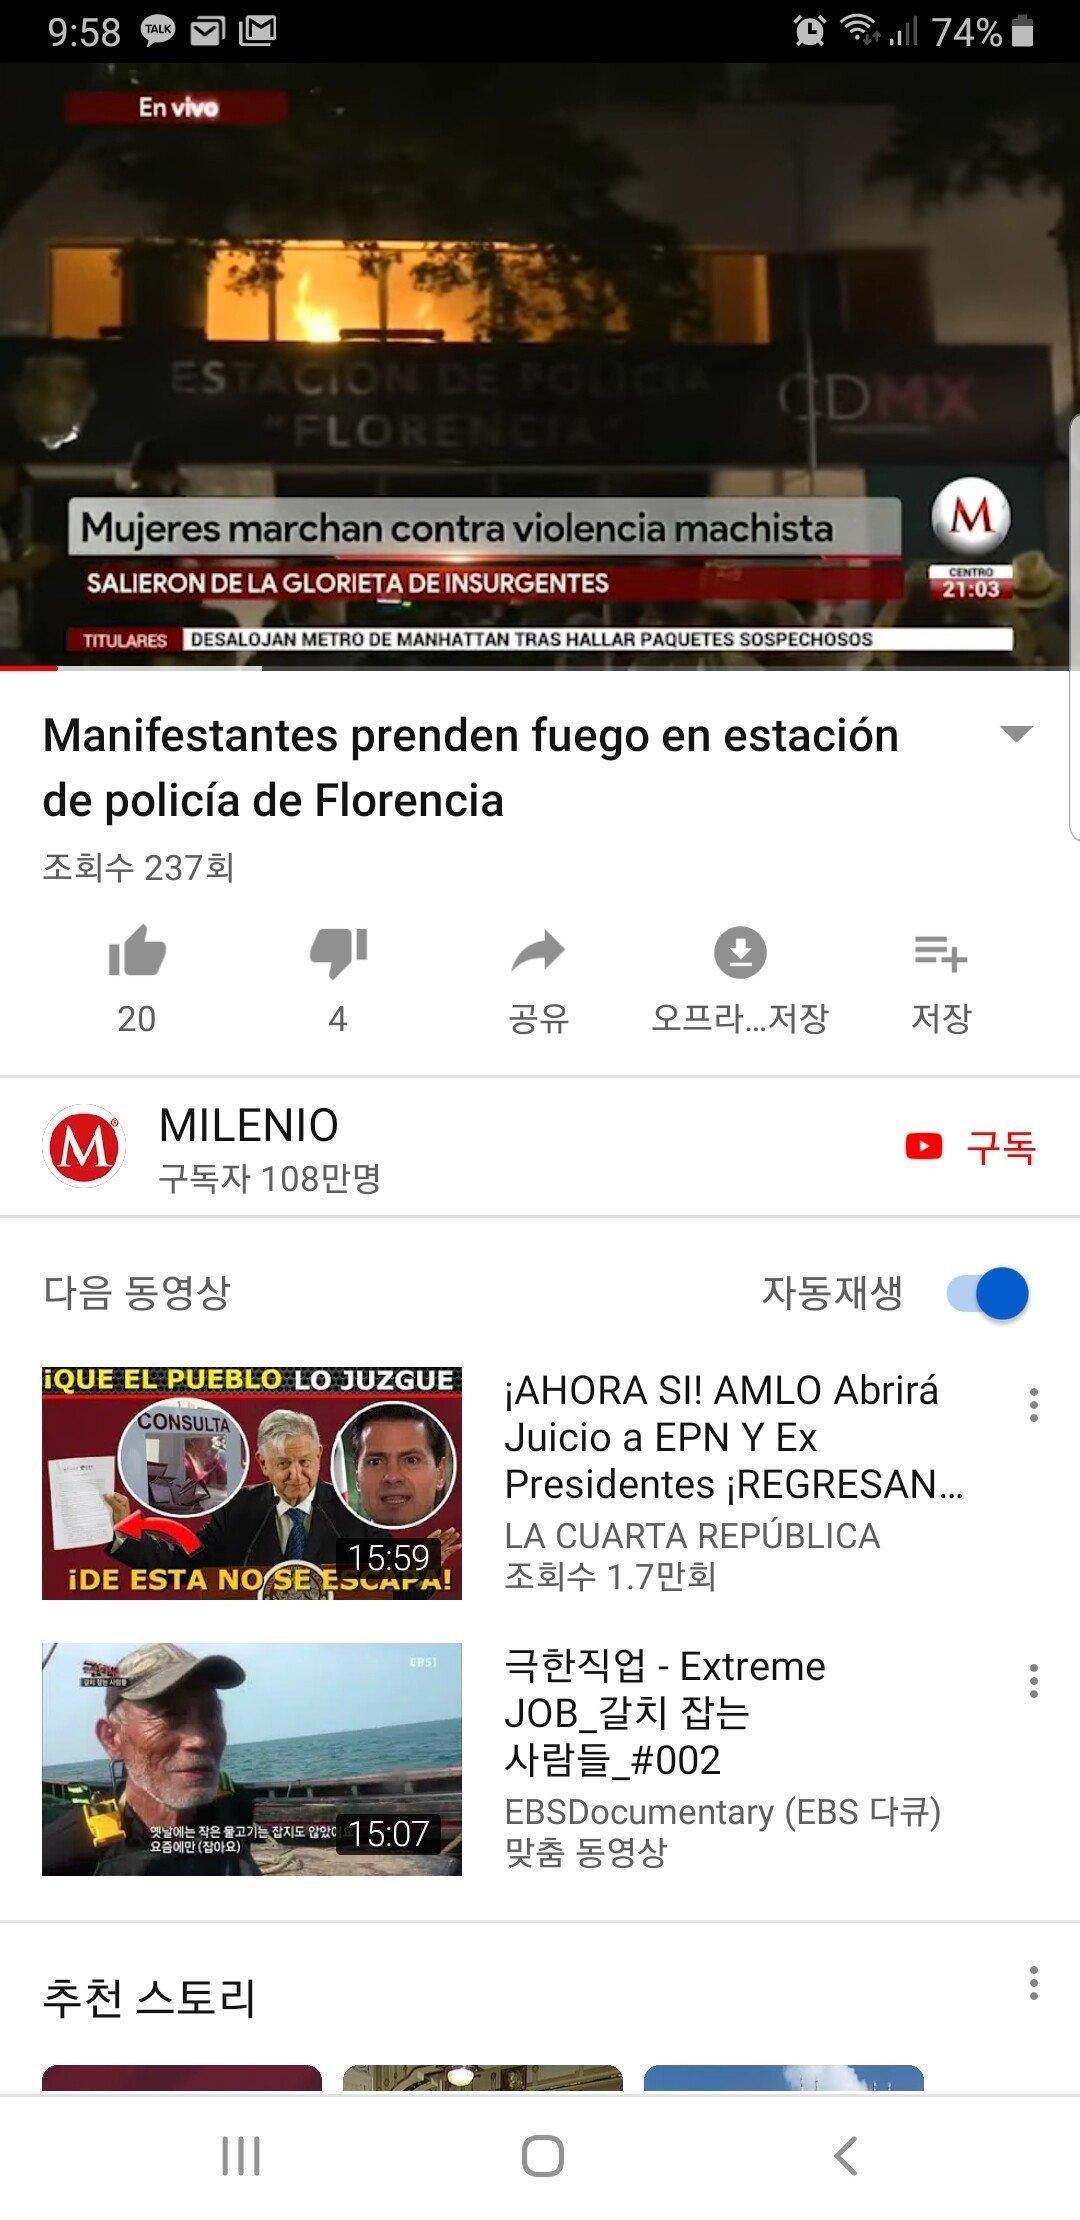 Screenshot_20190816-215807_YouTube.jpg 현재 멕시코 상황 - 미친X들의 시위